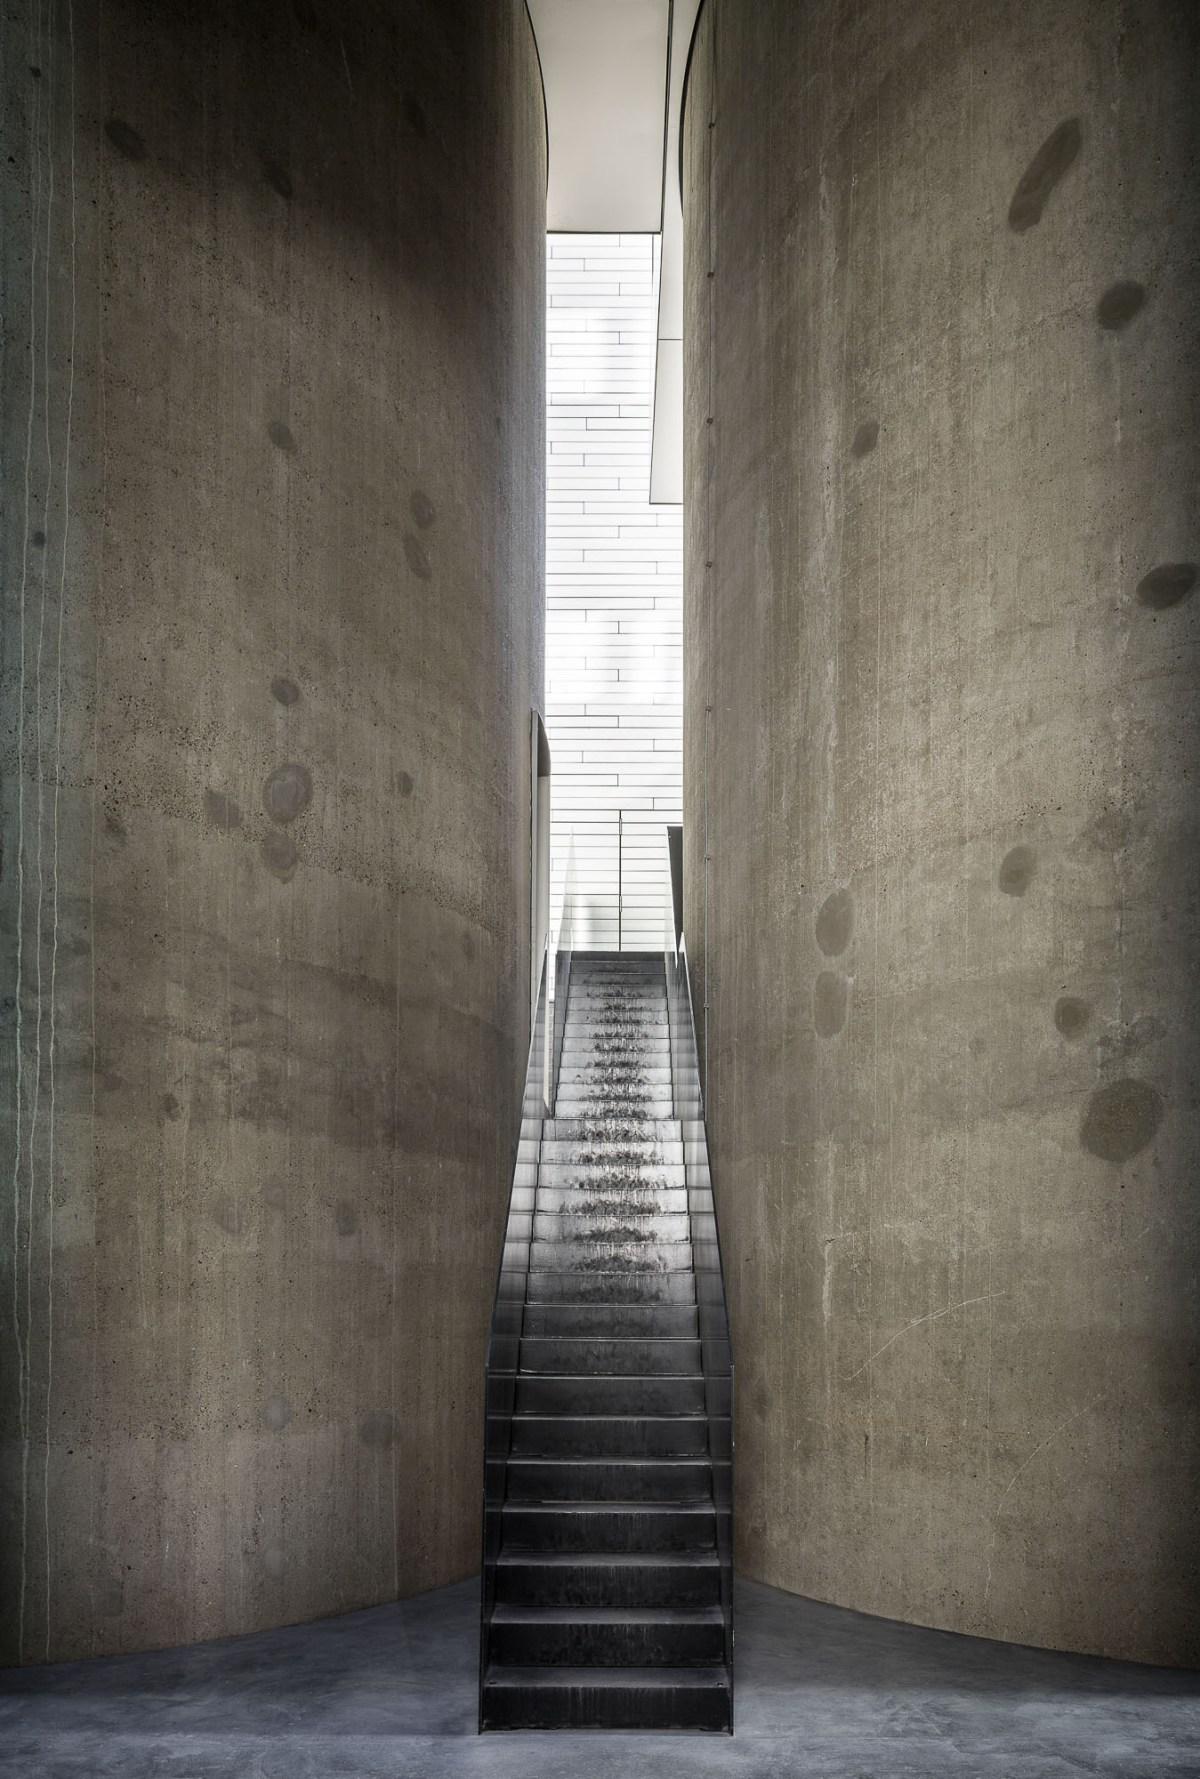 art-dealer-axel-vervoordt-belgian-estate-by-frederik-vercruysse-17